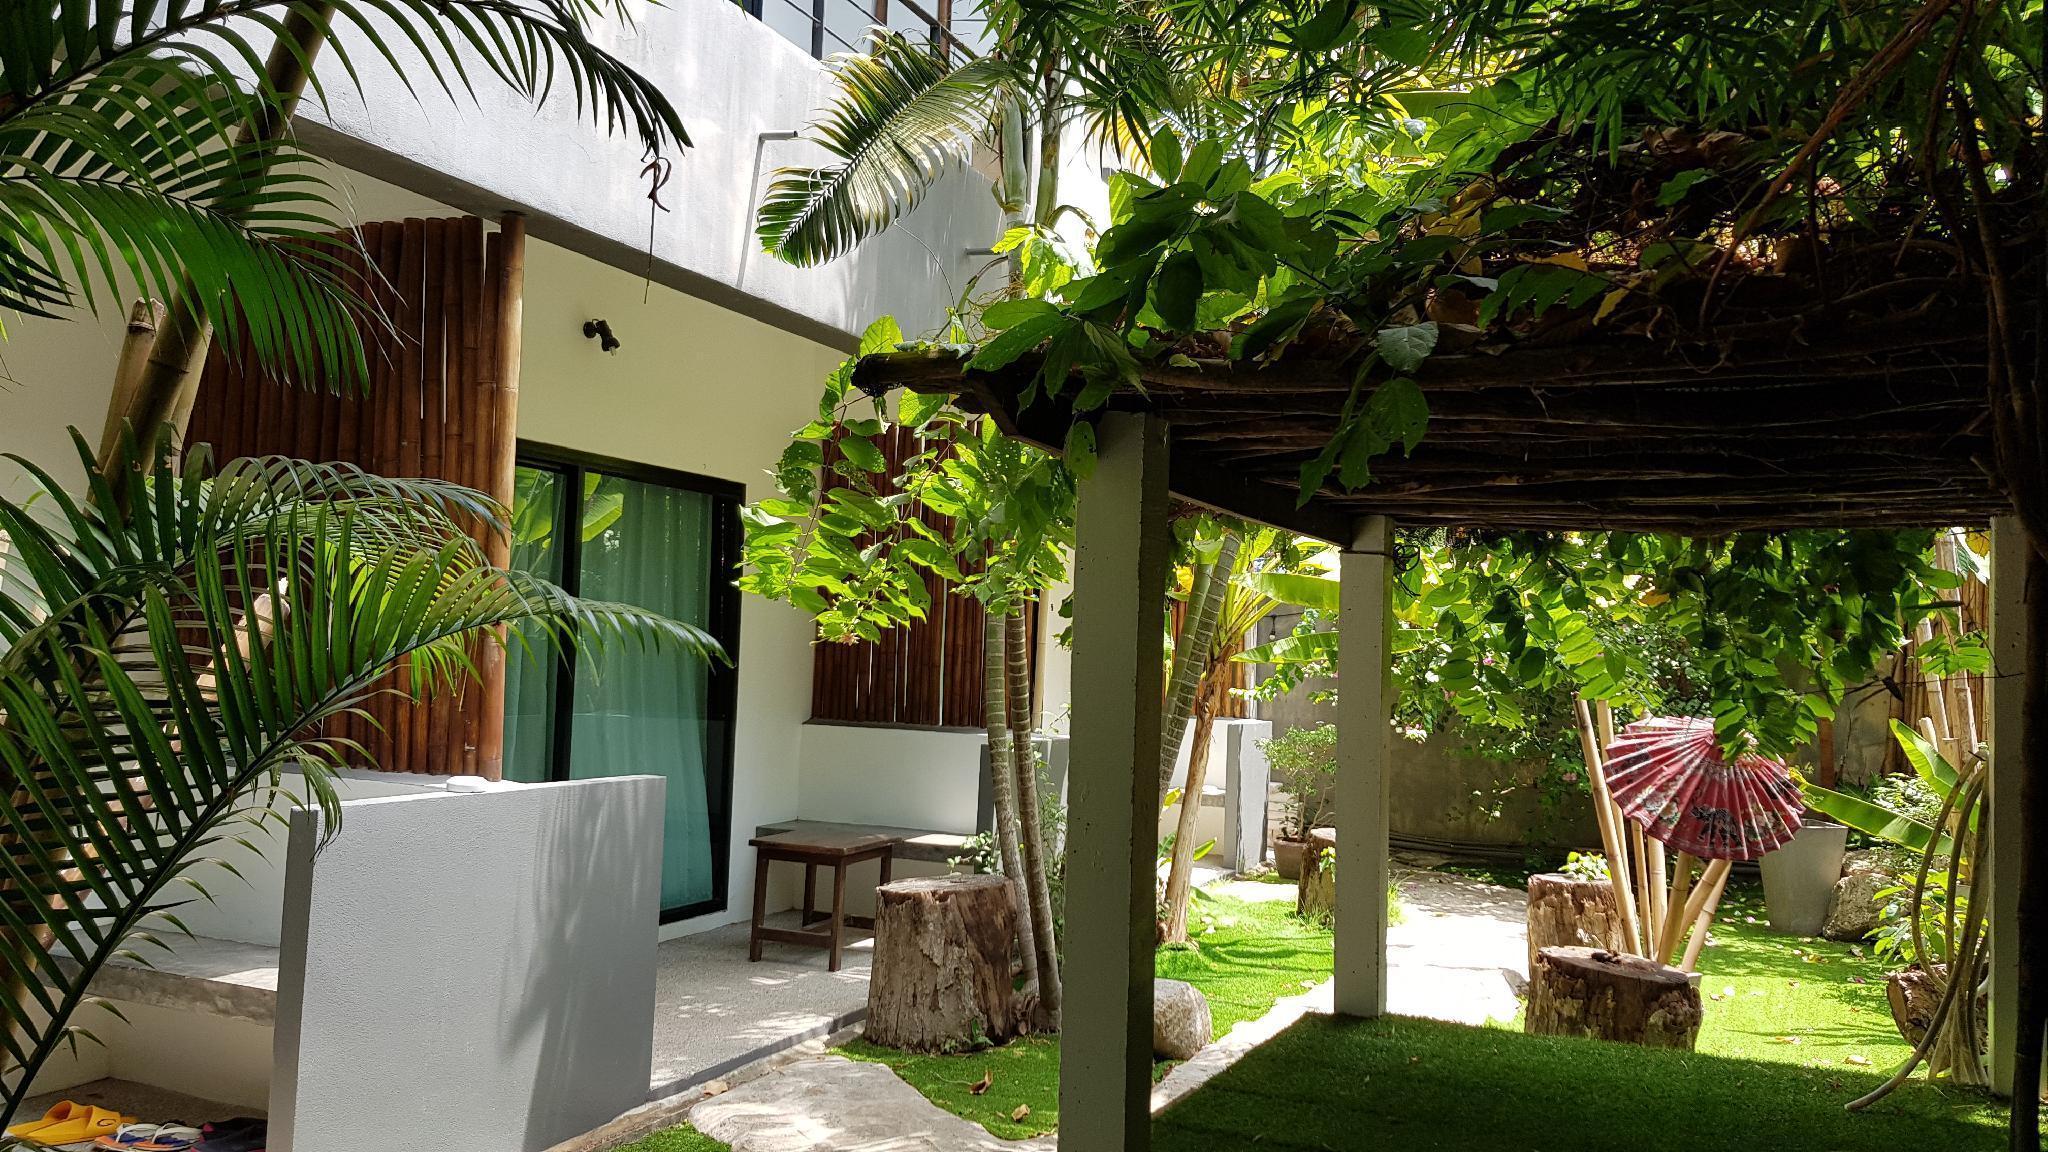 Sairee Sairee Guesthouse ทรายรี ทรายรี เกสท์เฮาส์